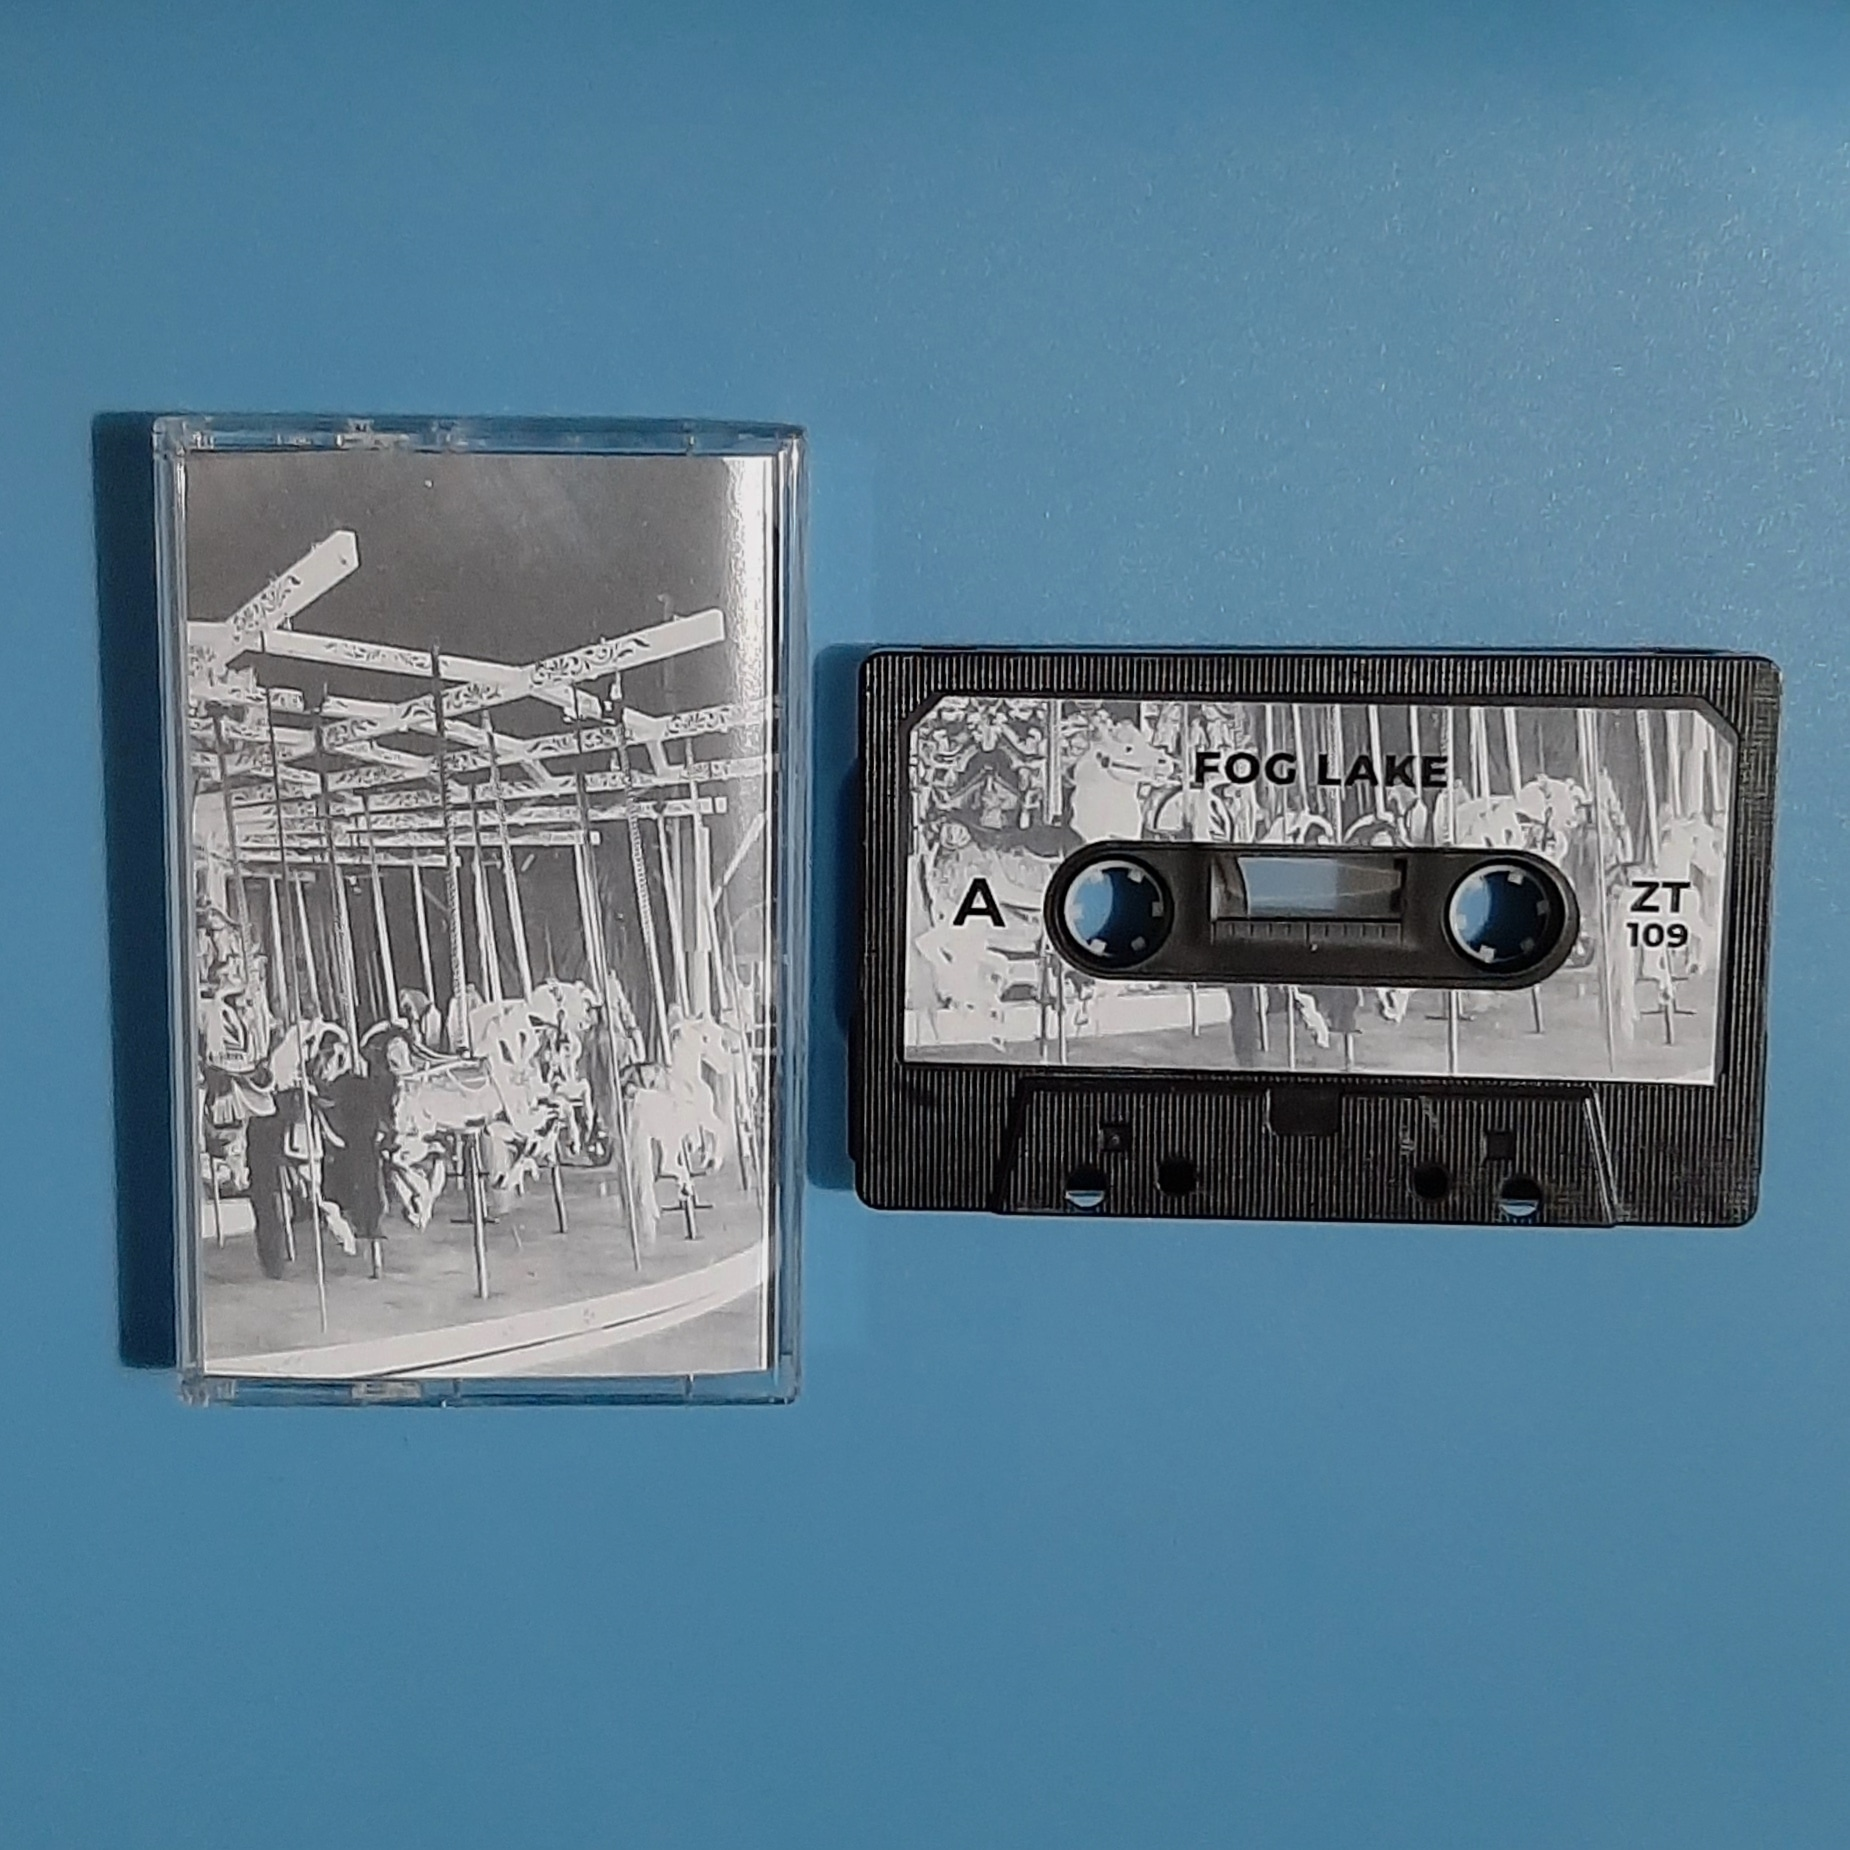 Fog Lake - carousel [ep] (Z Tapes)